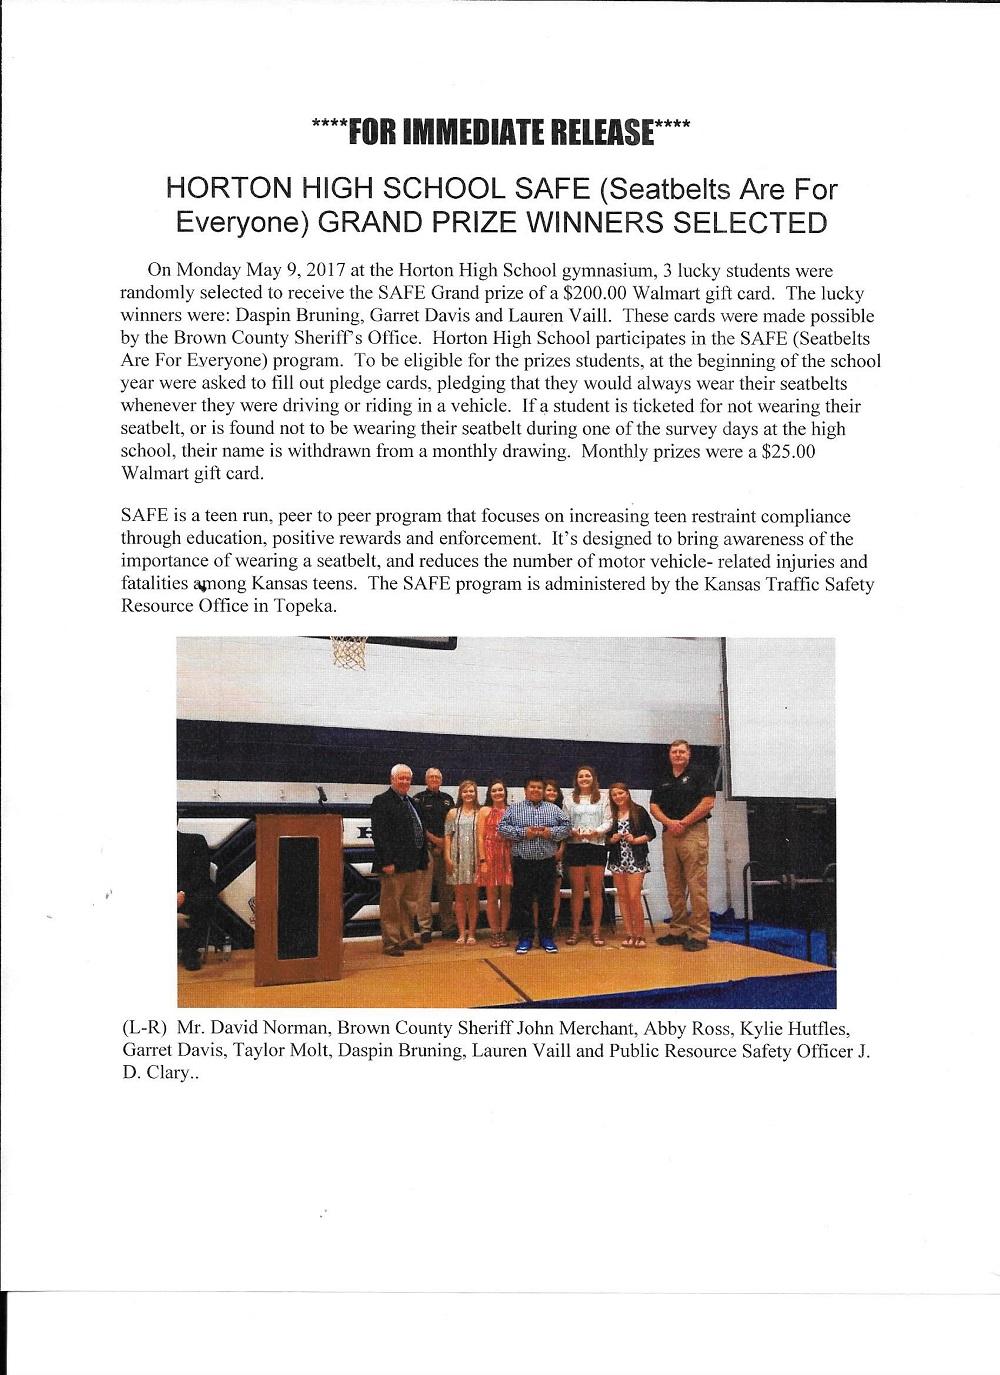 Kansas brown county everest - Horton High School Safe Winners